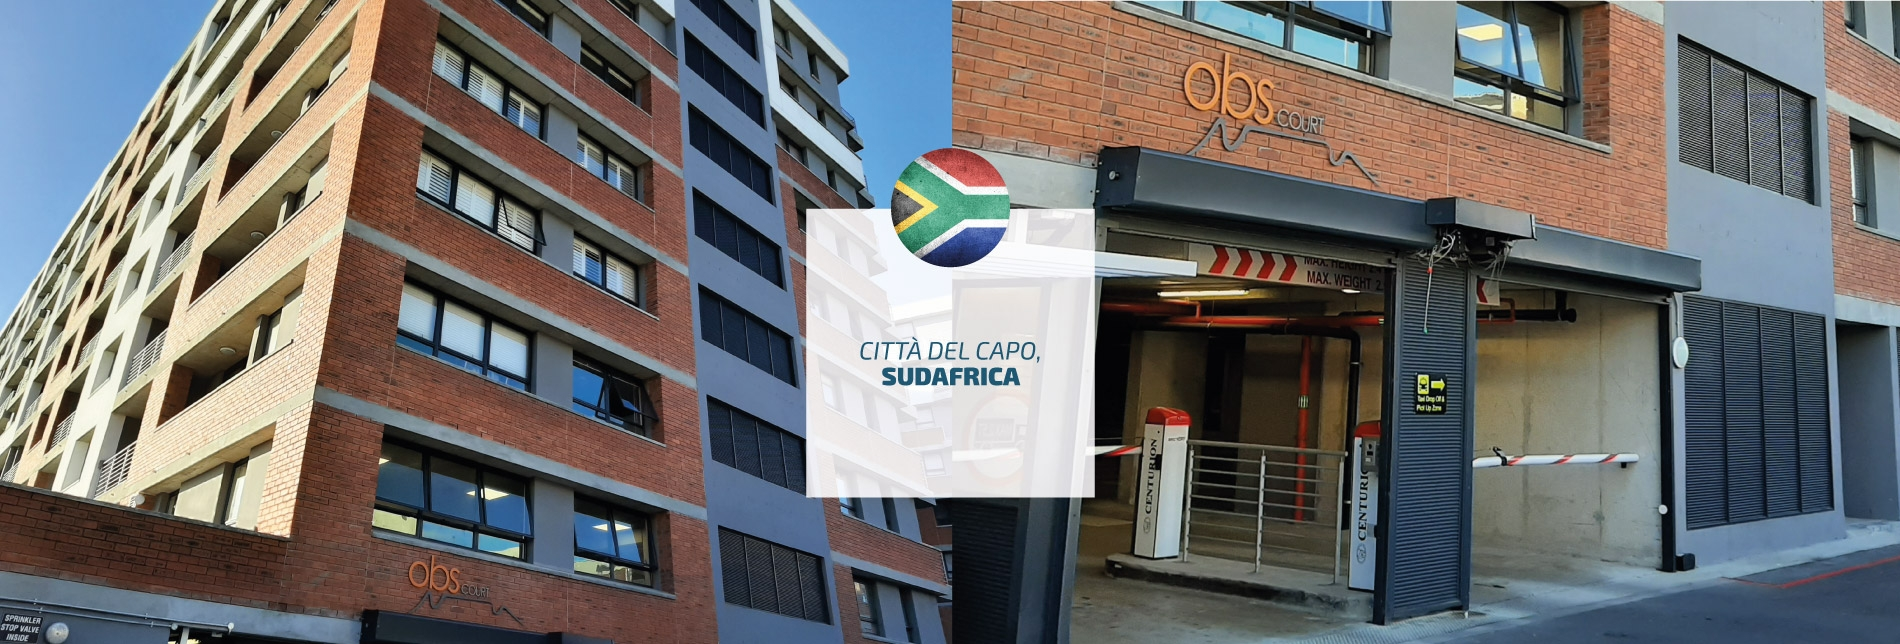 Africa OBS Court Città del Capo Sud Africa